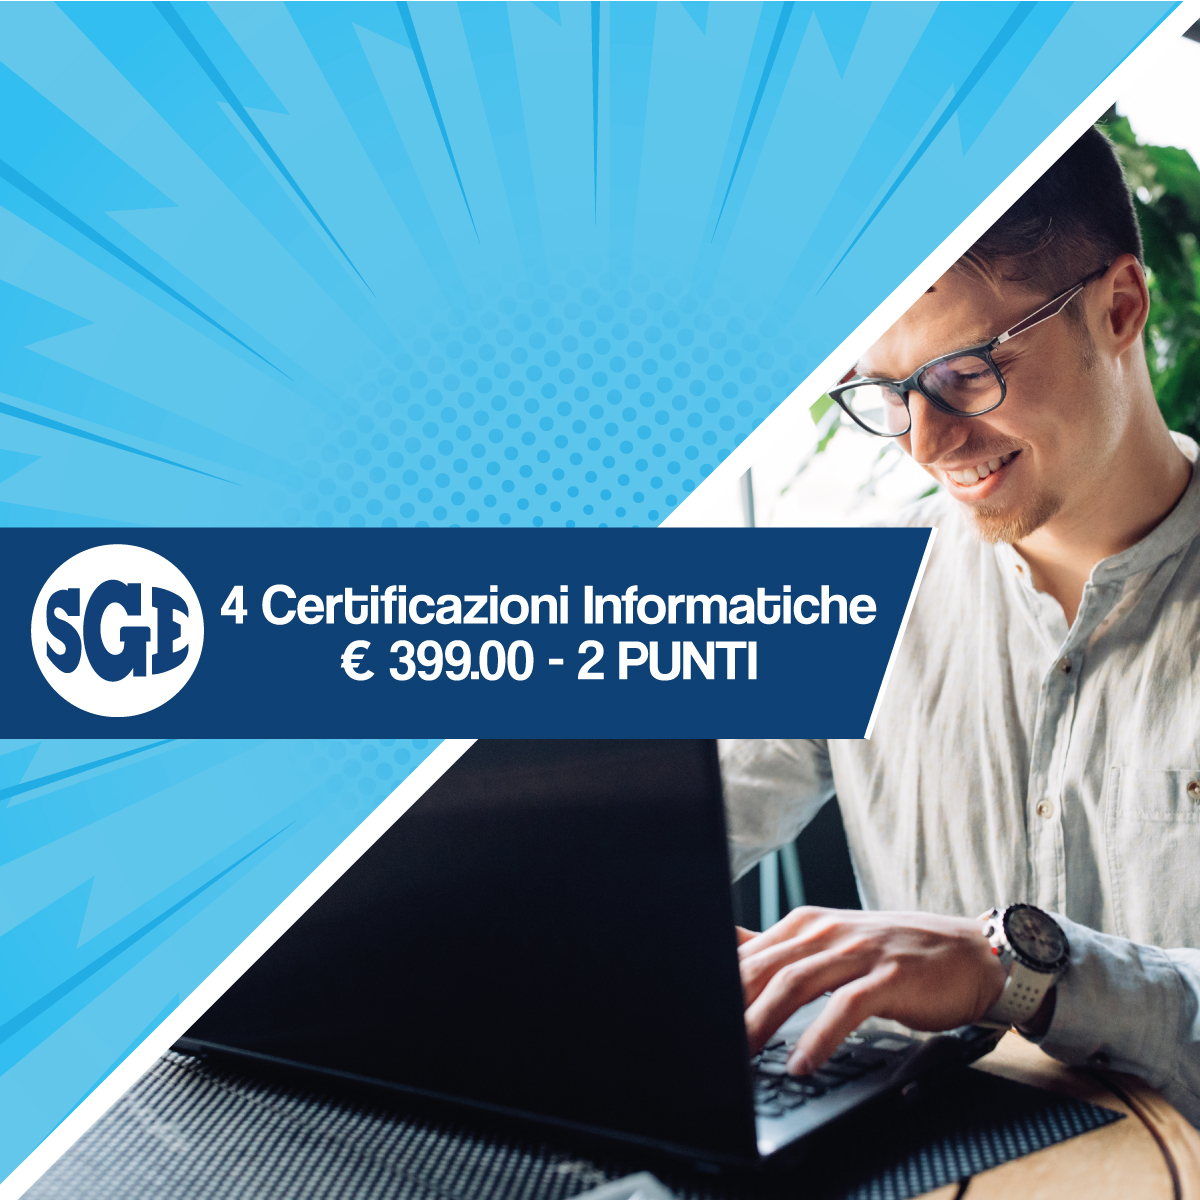 4 Certificazioni Informatiche € 399.00 - 2 PUNTI